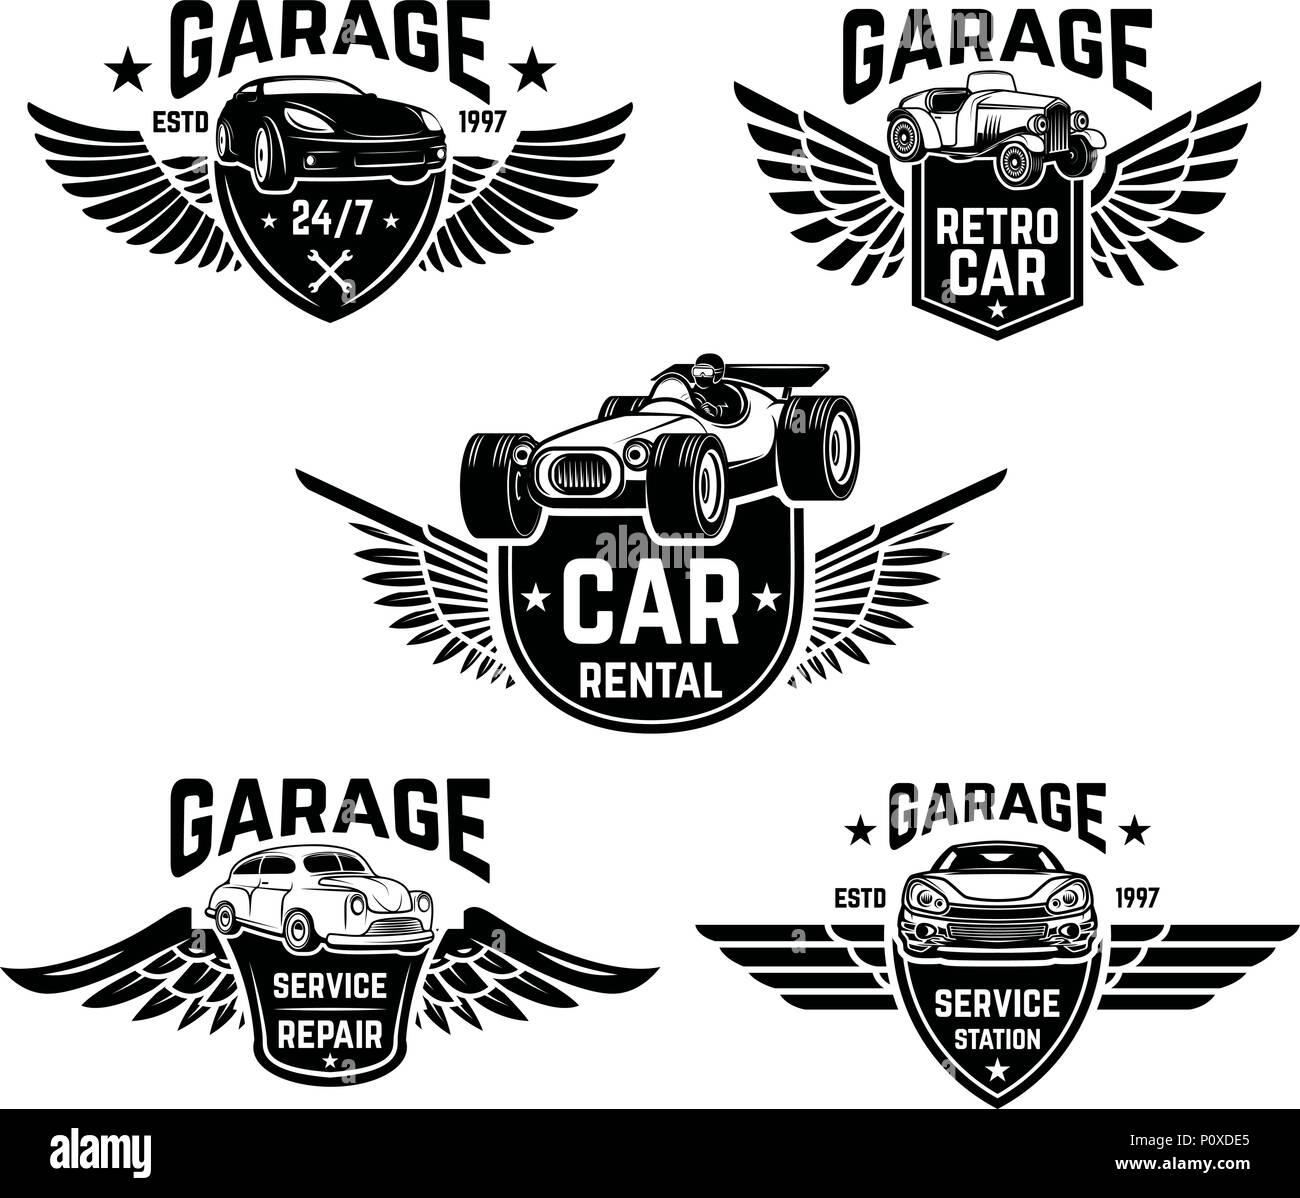 Car Repair, Garage, Auto Service Emblems. Design Elements